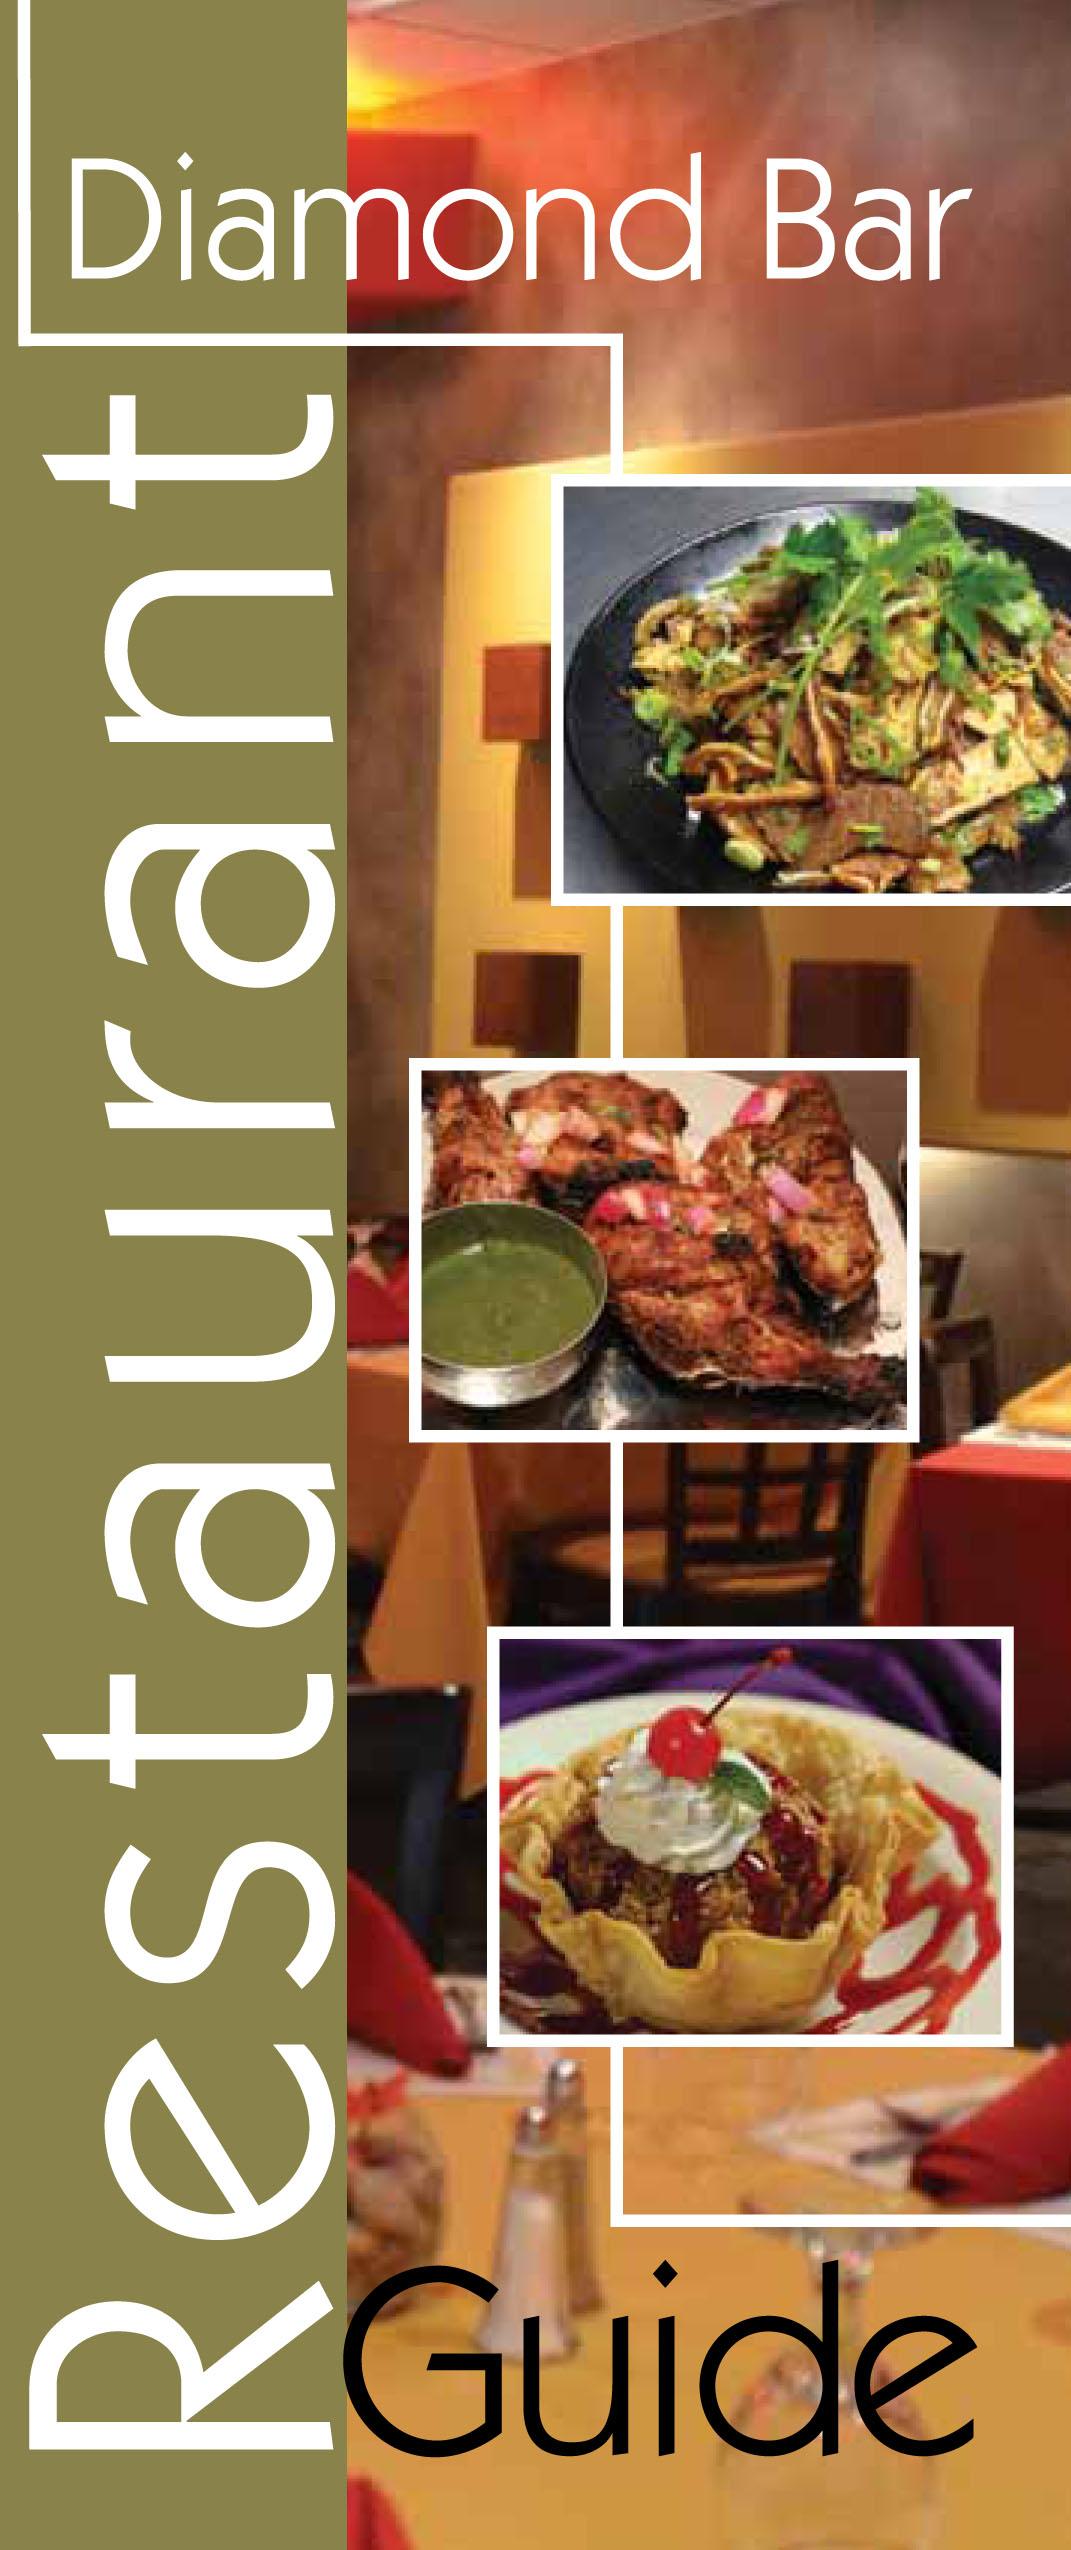 DB restaurant guide